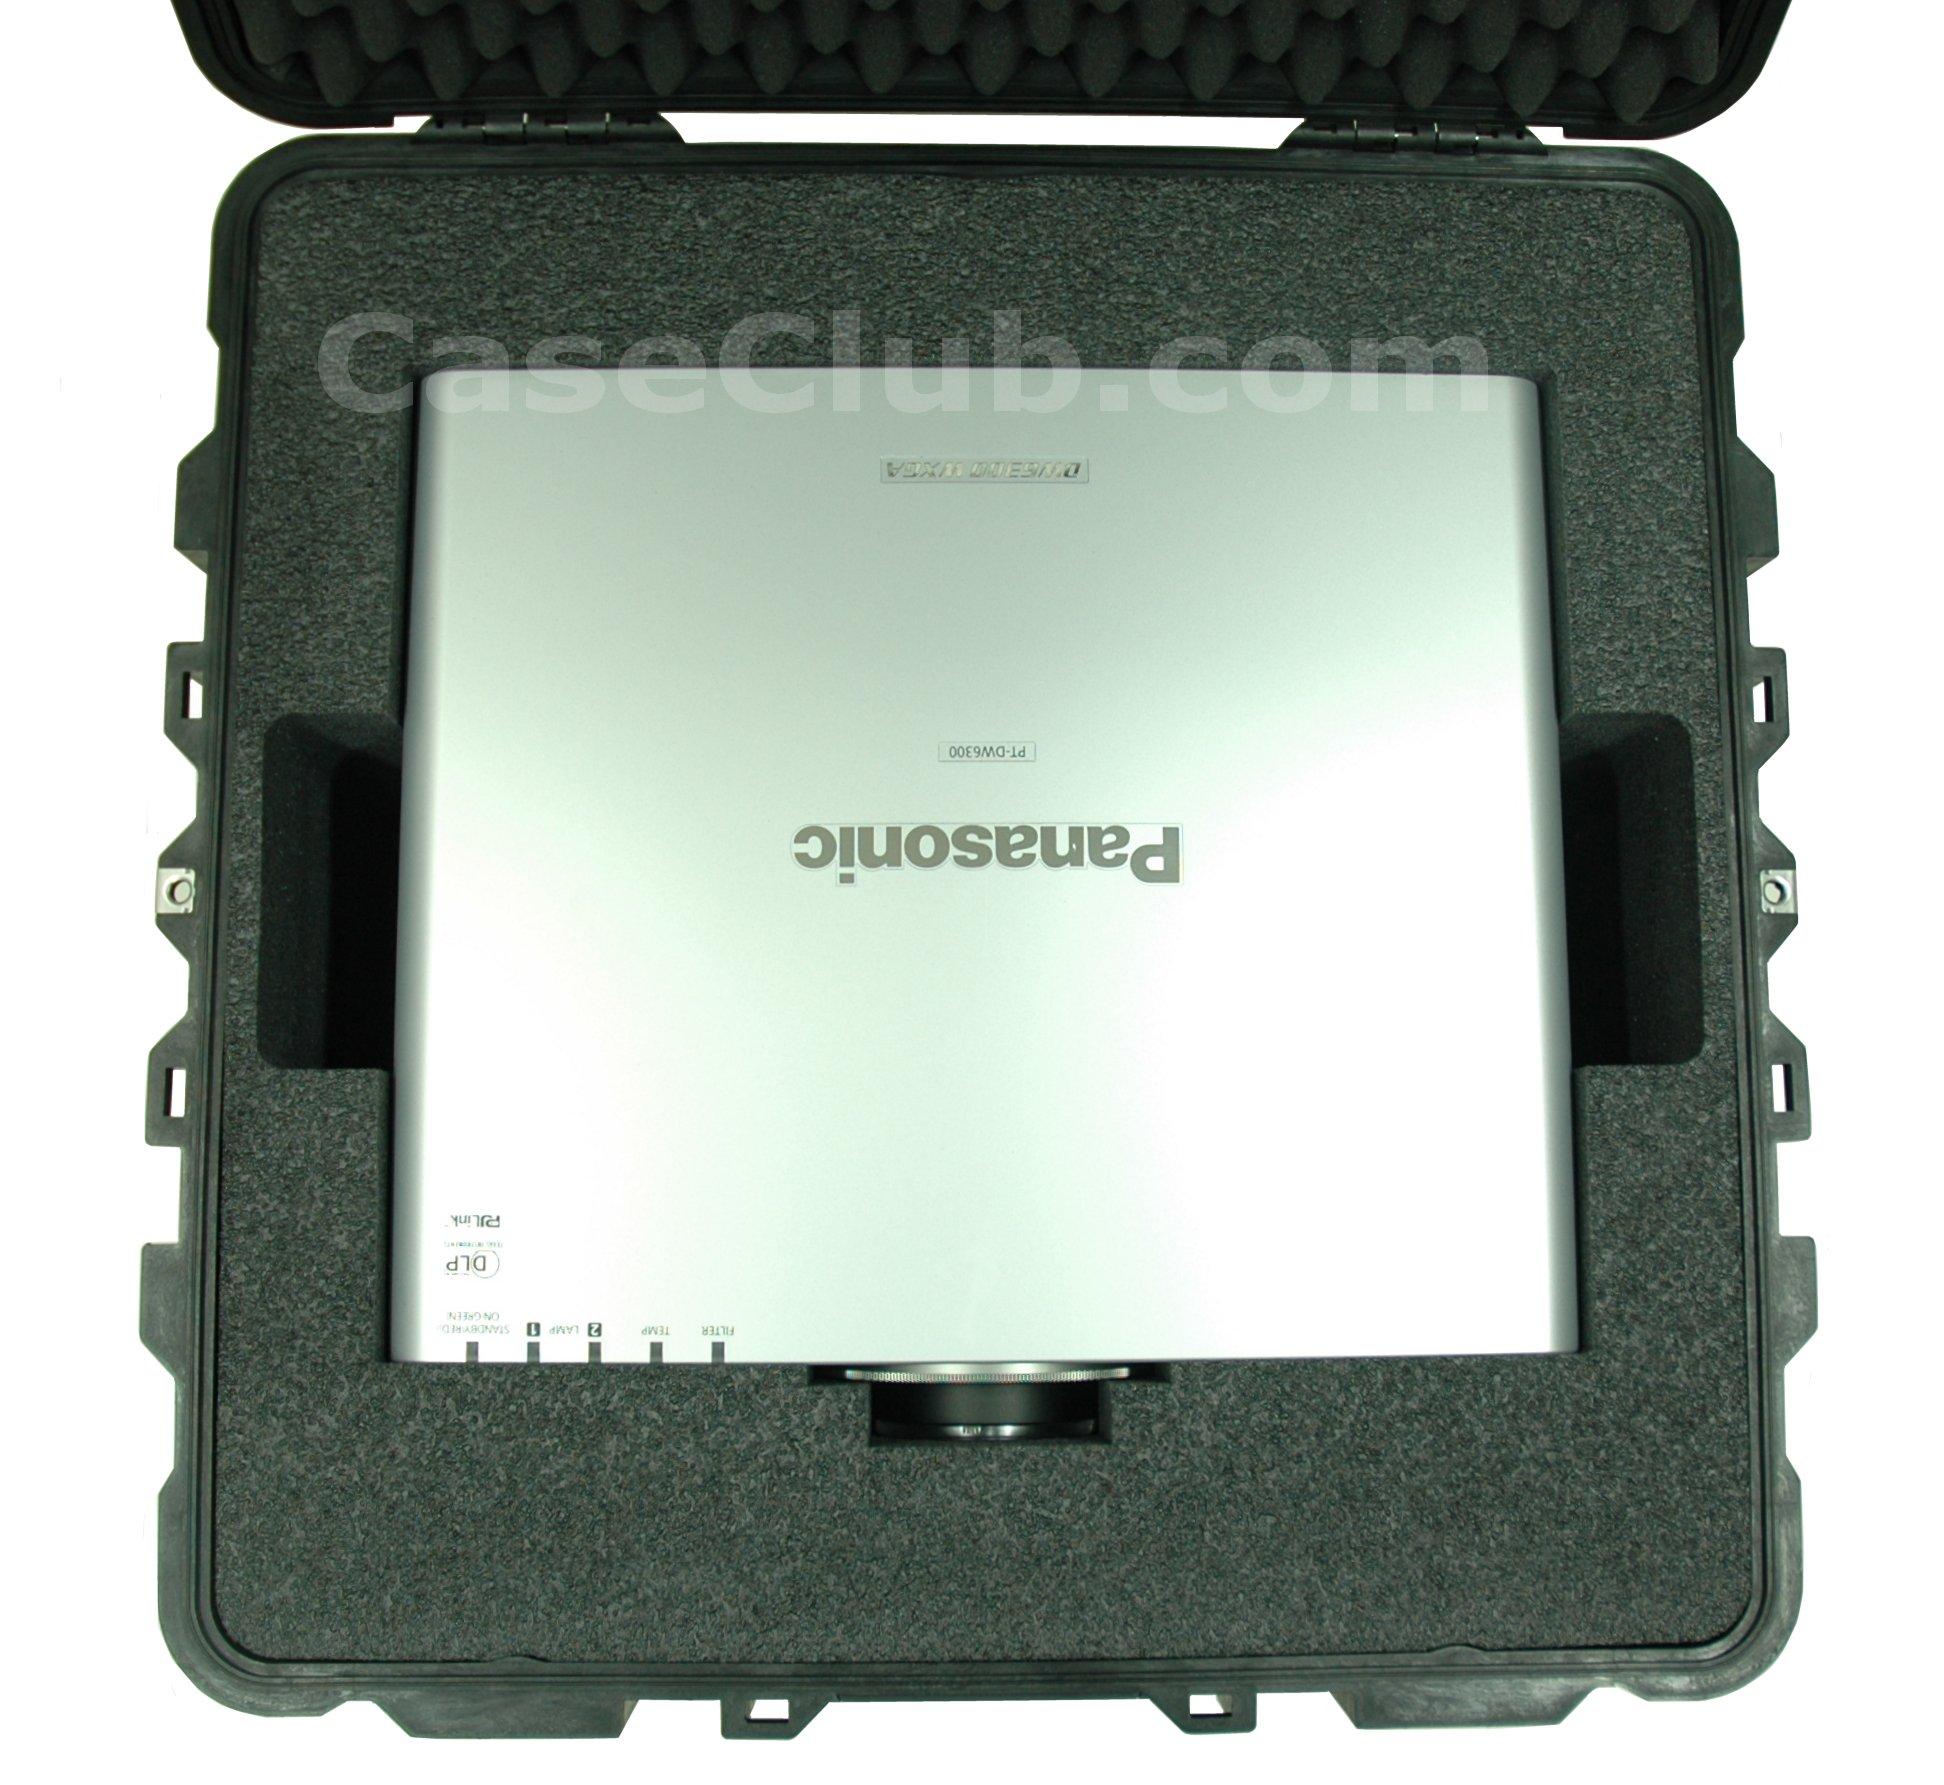 Pelican™ 1640 Case Custom Foam Example: Panasonic PT-DW6300US DLP Projector Case